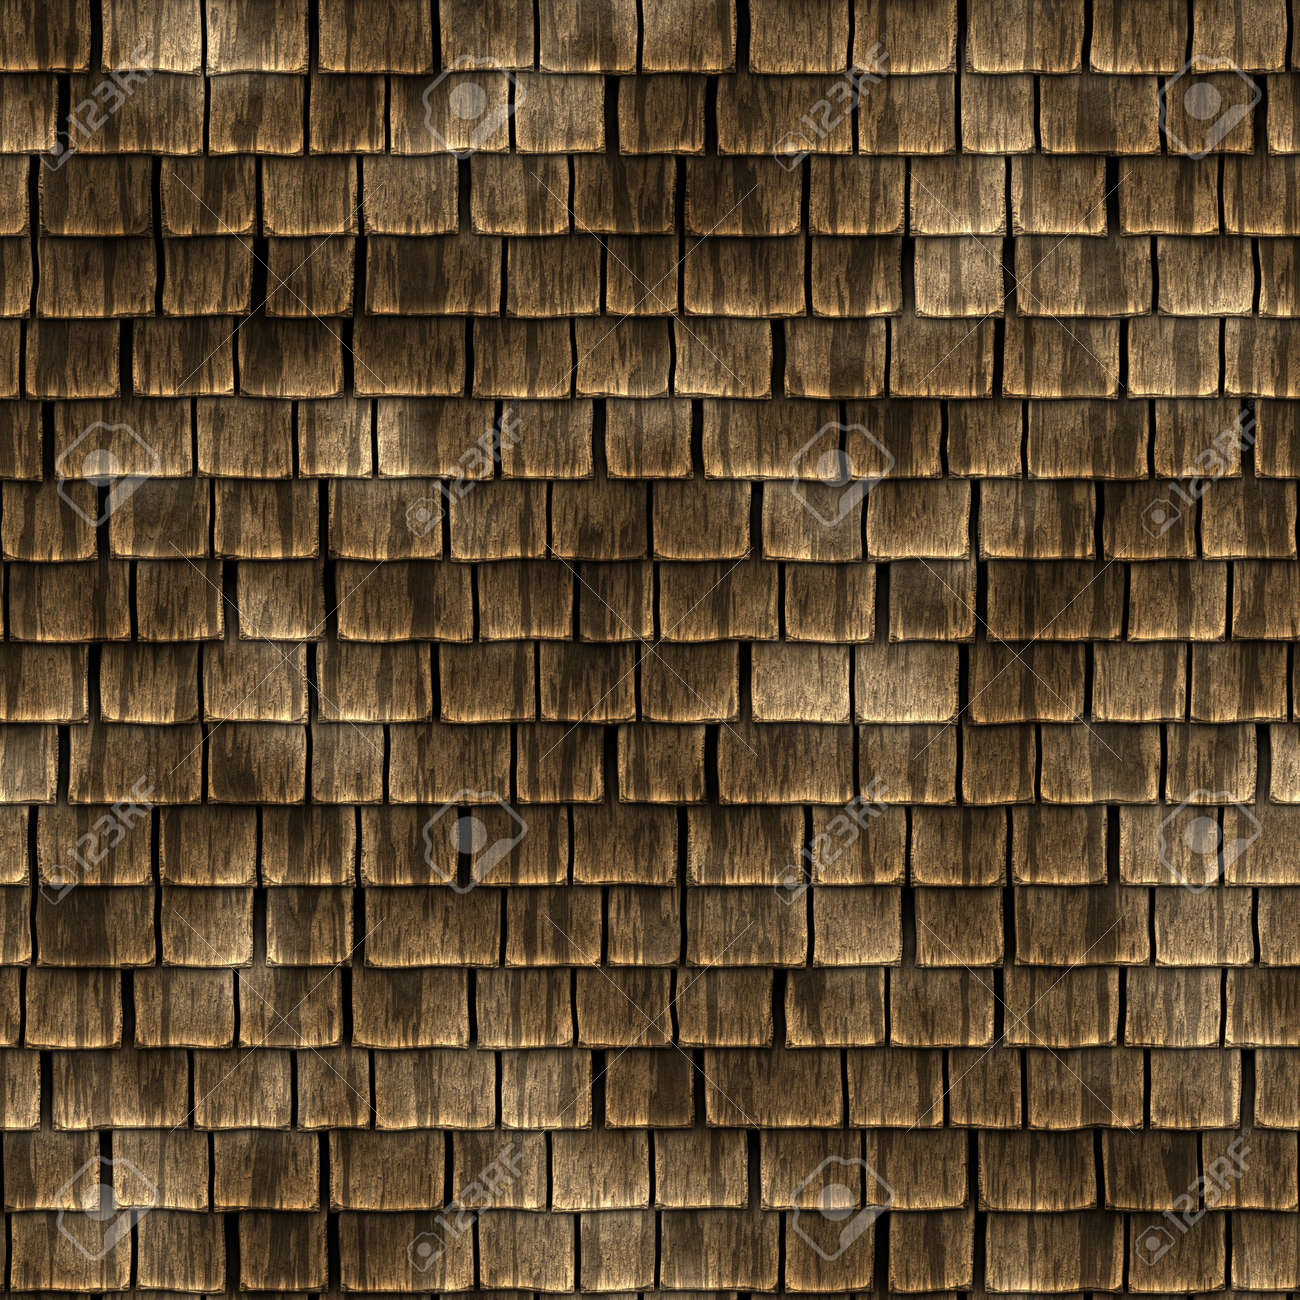 Kachel textur  Dach Textur Lizenzfreie Vektorgrafiken Kaufen: 123RF